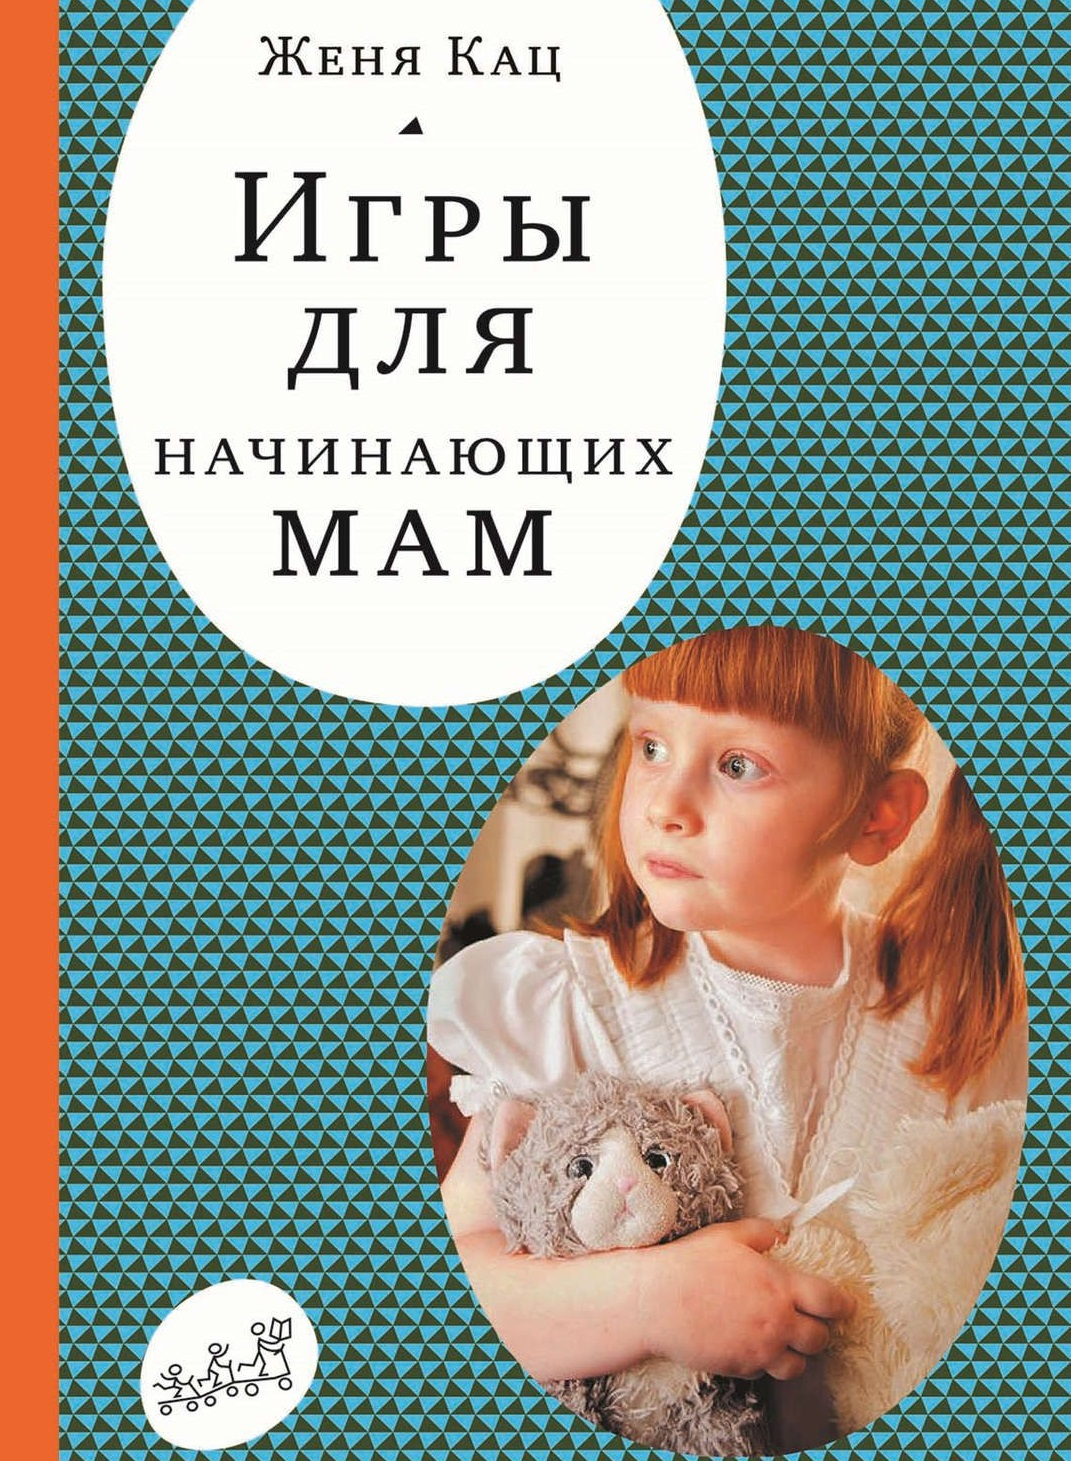 Женя Кац «Ігри для починаючих мам»